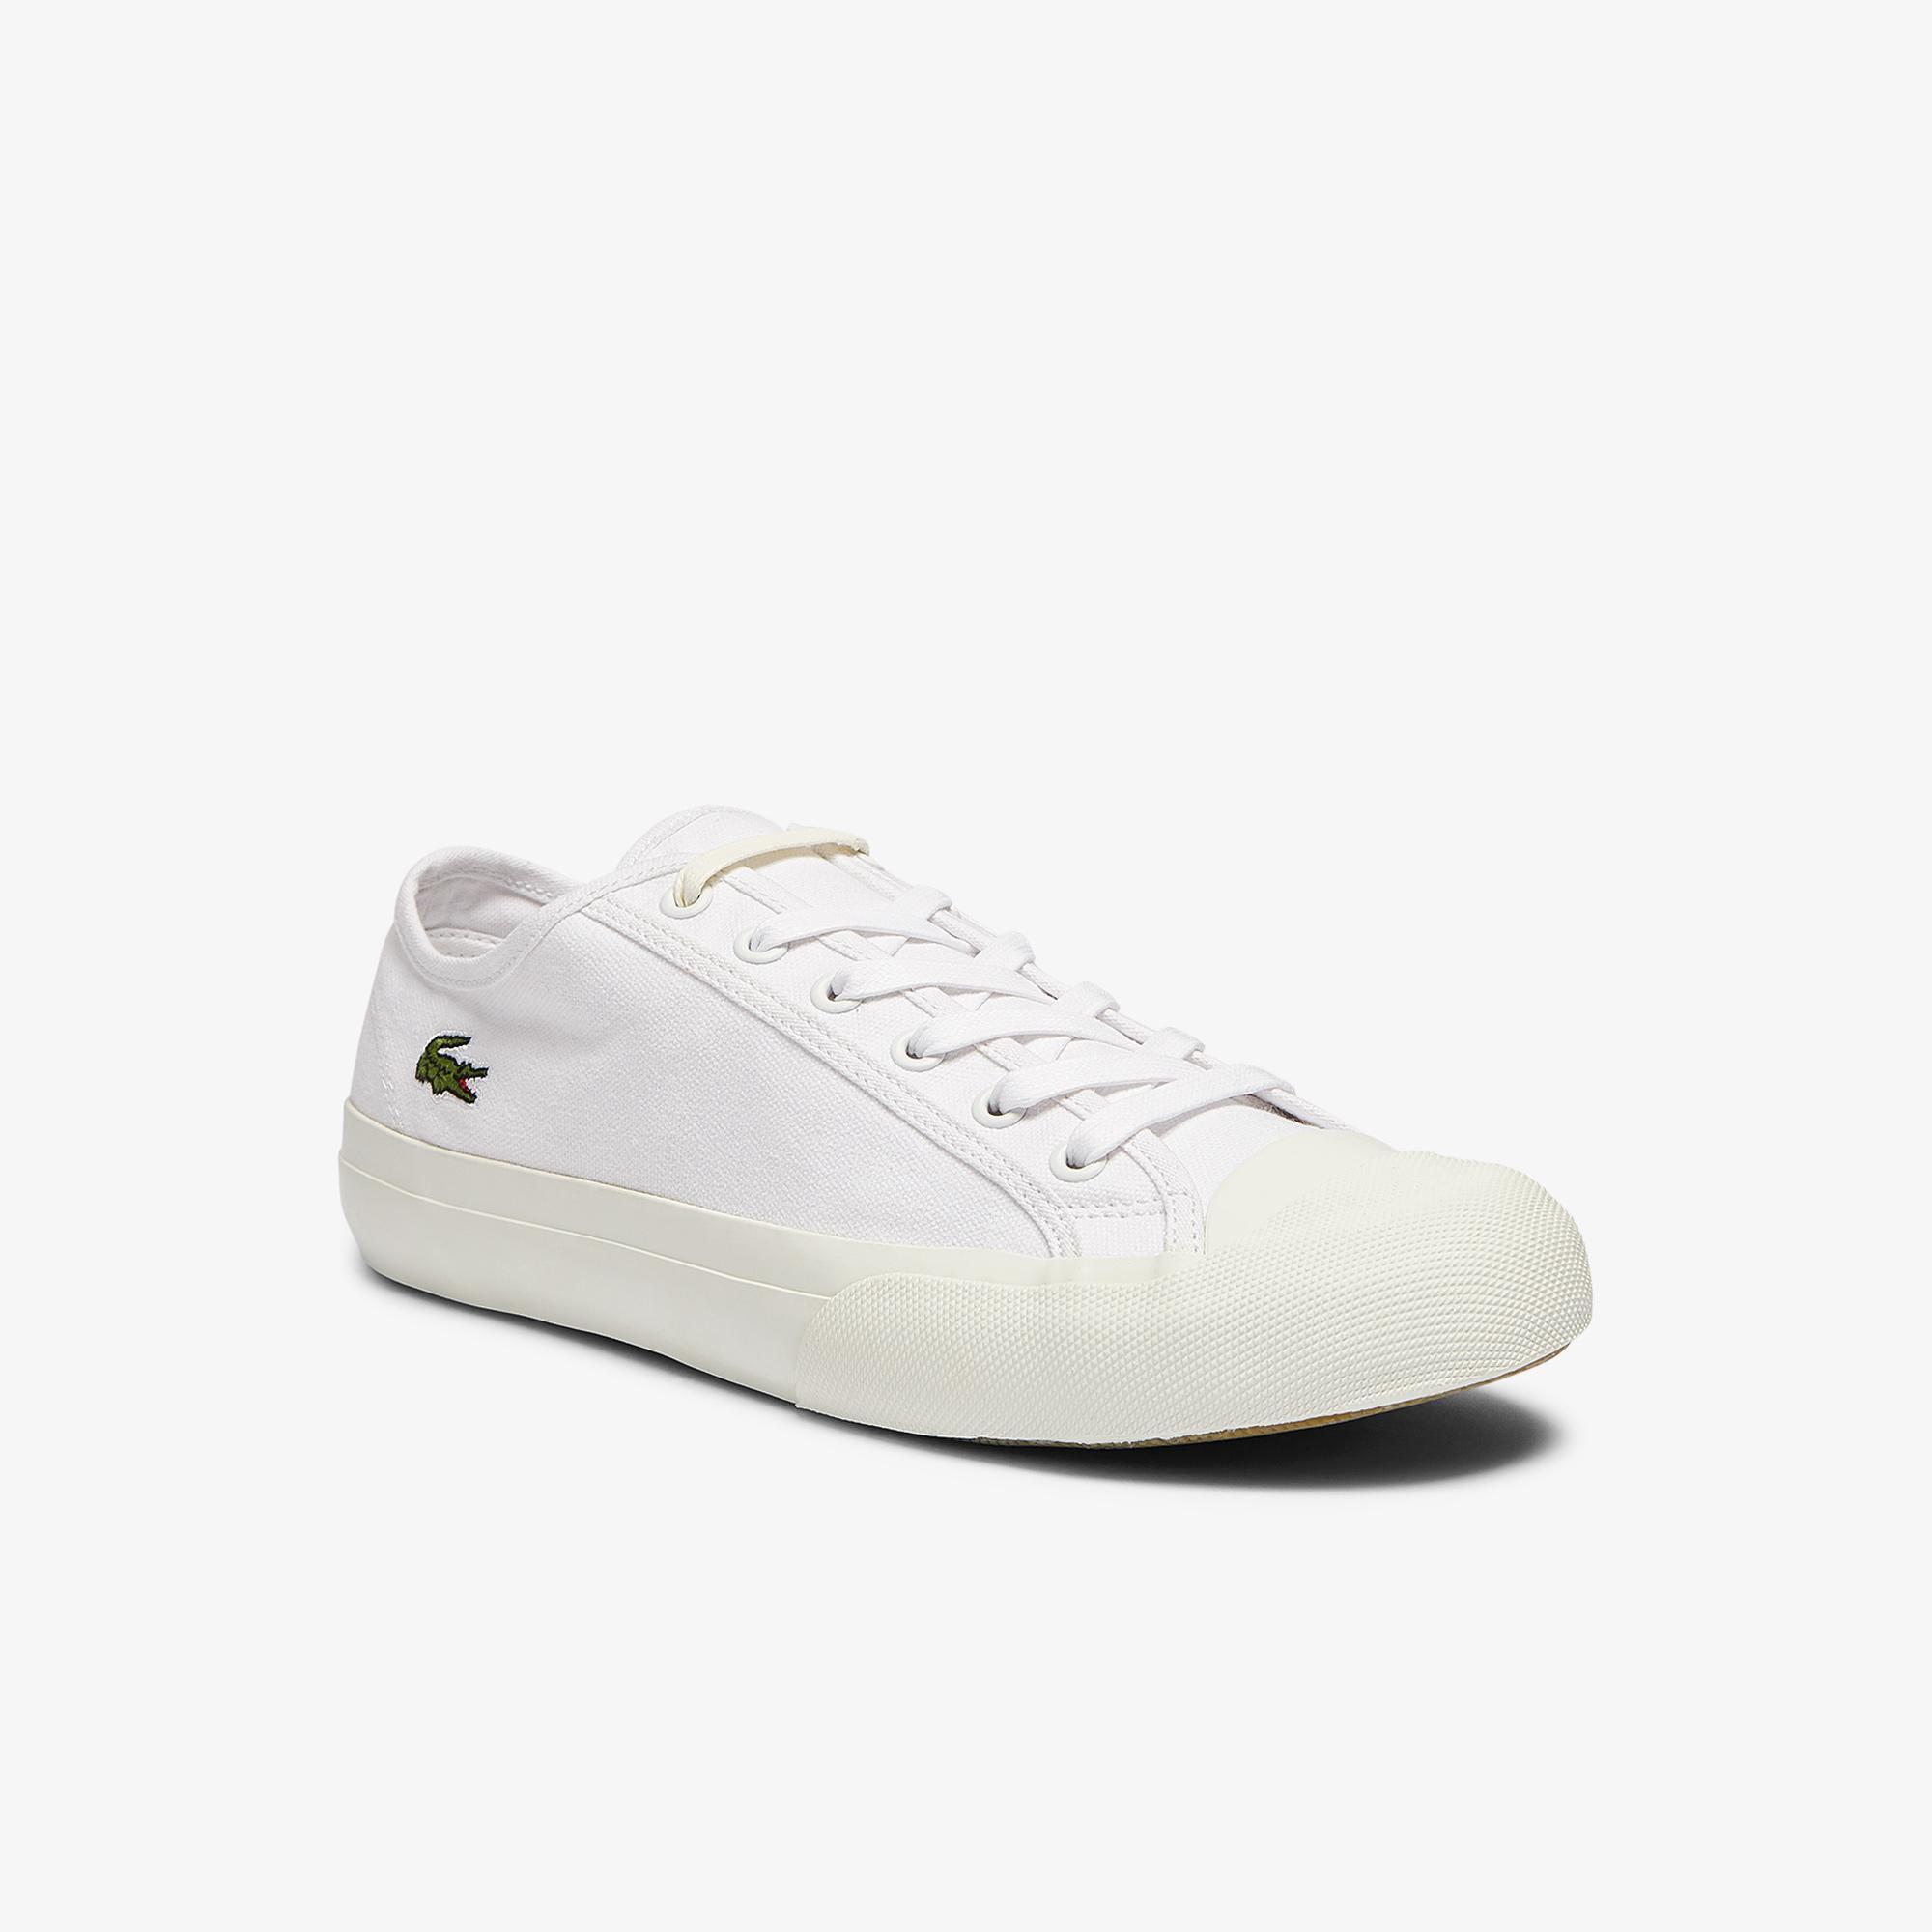 Lacoste Men's Topskıll 0921 1 Cma Shoes